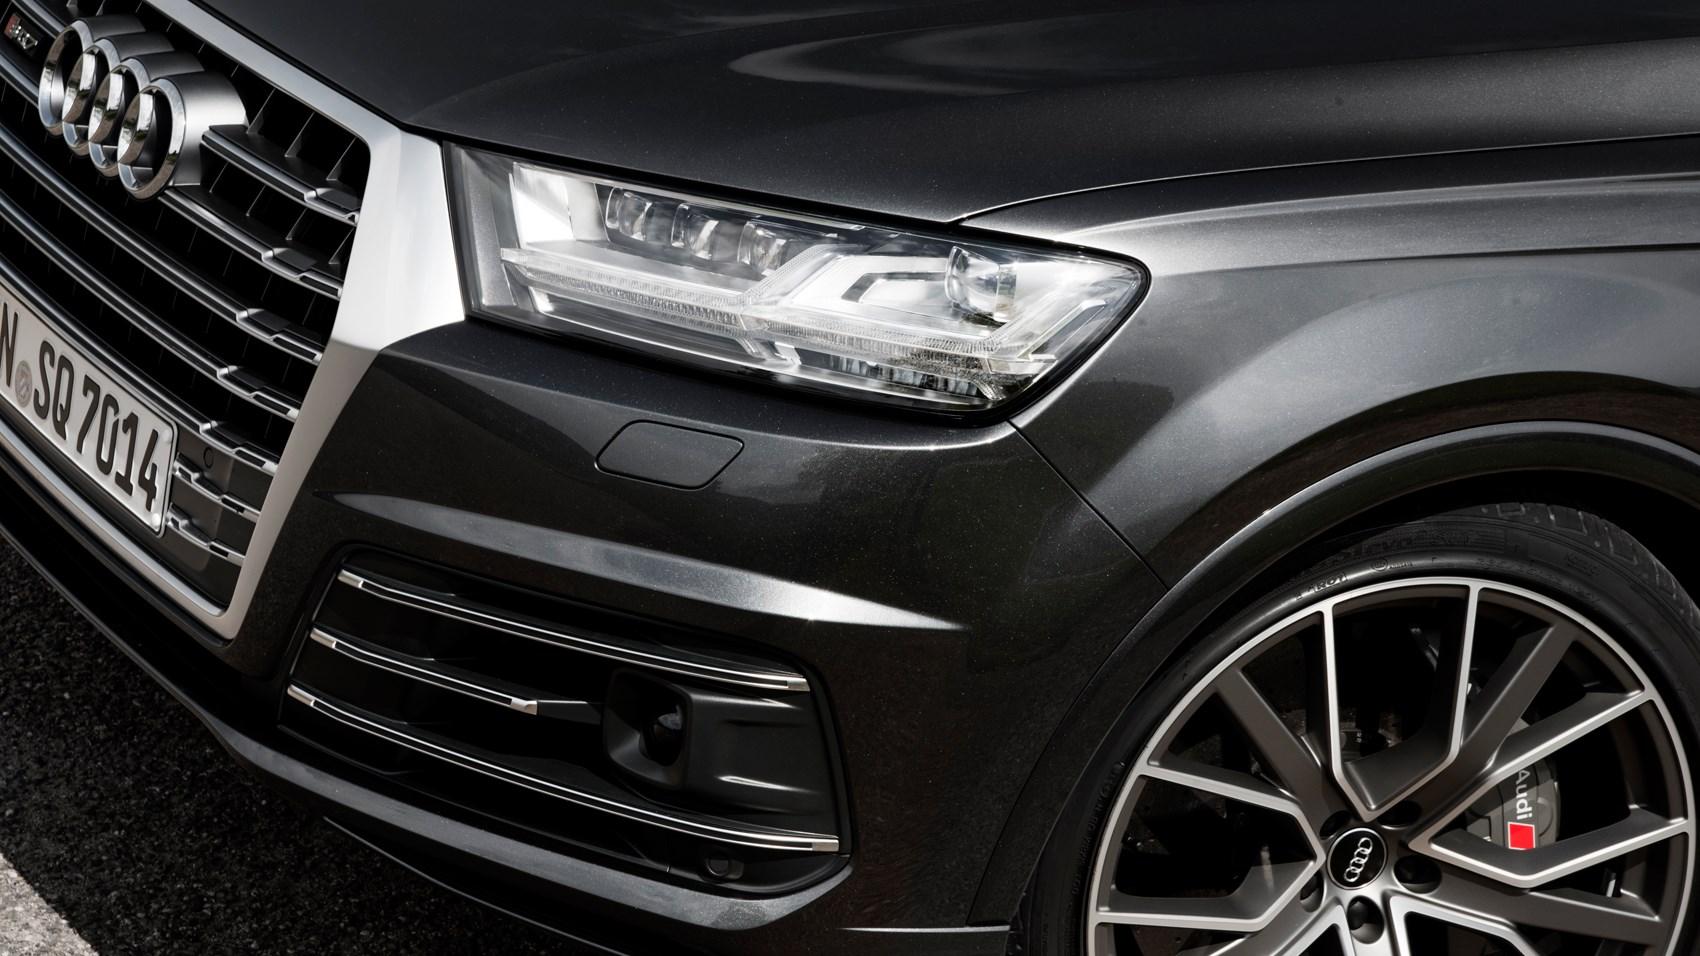 Audi Lease Deals >> Audi SQ7 TDI (2016) review by CAR Magazine